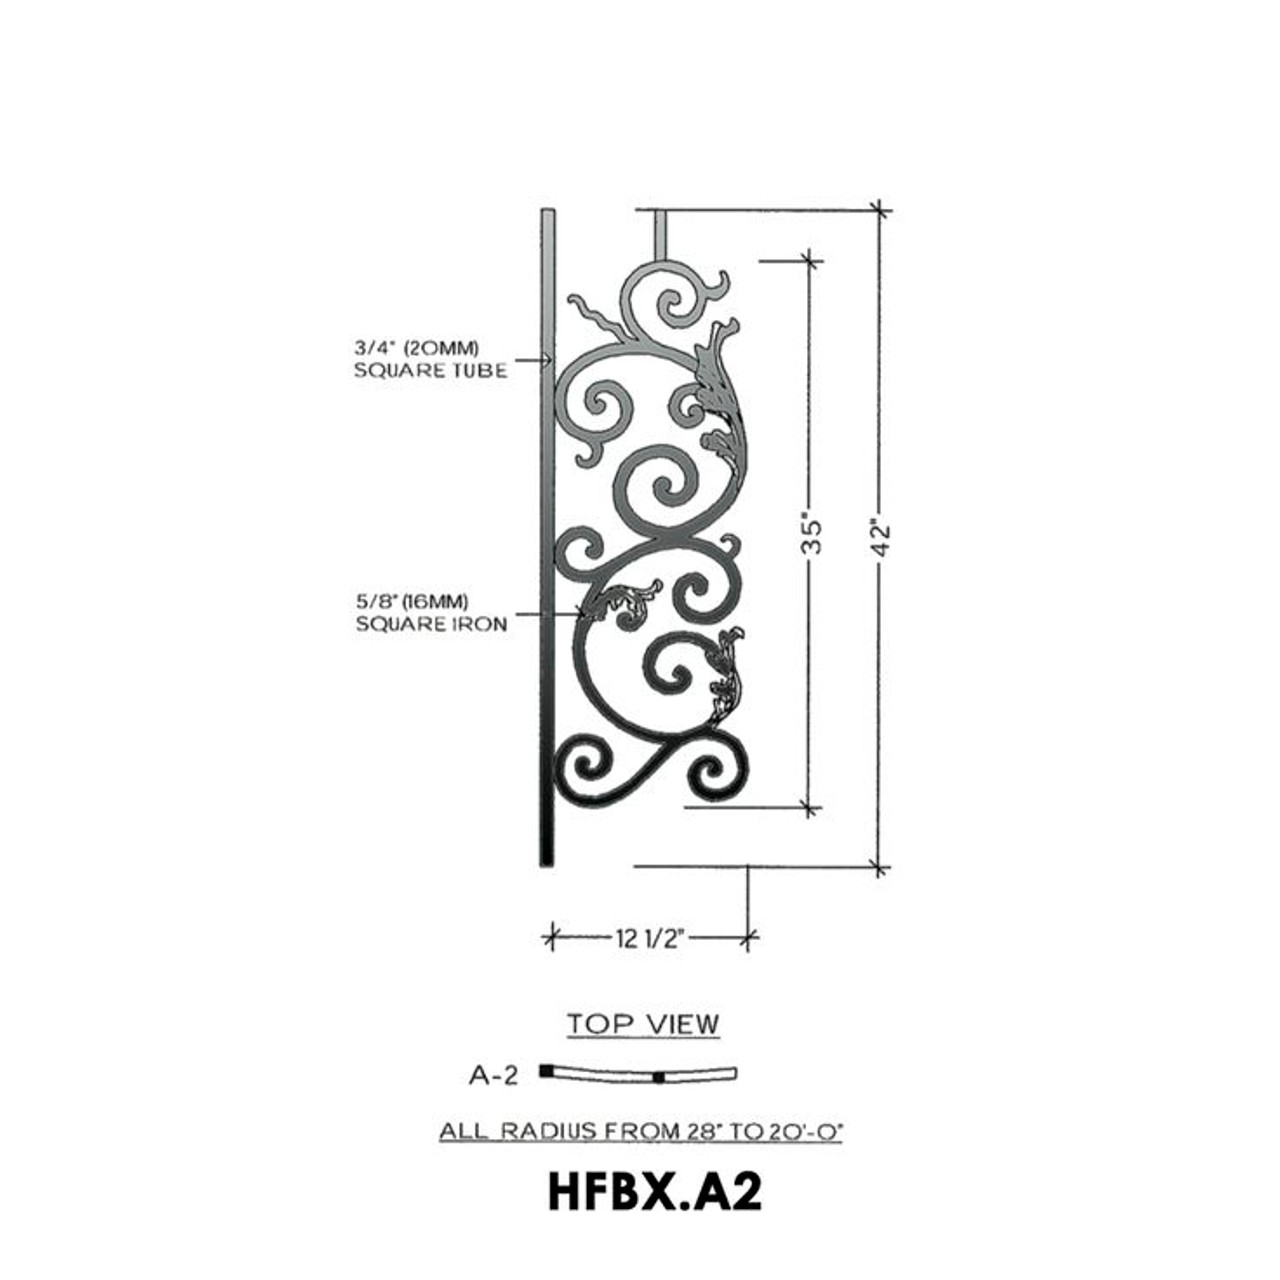 HFBX.A2 Bordeaux Radius Balcony Iron Panel